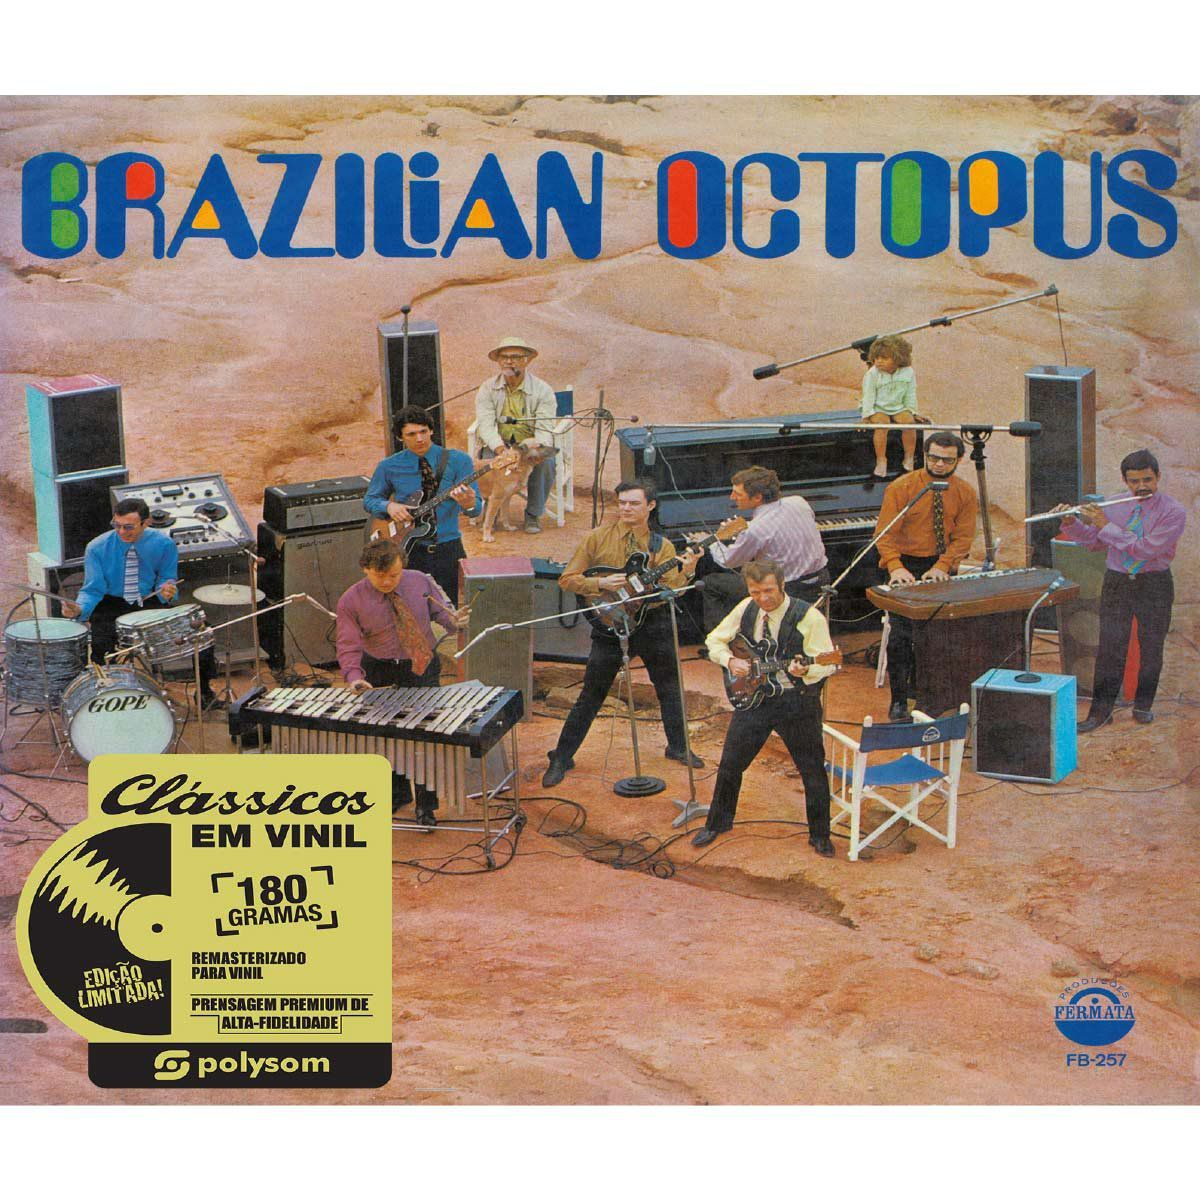 LP Brazilian Octopus  - bandUP Store Marketplace